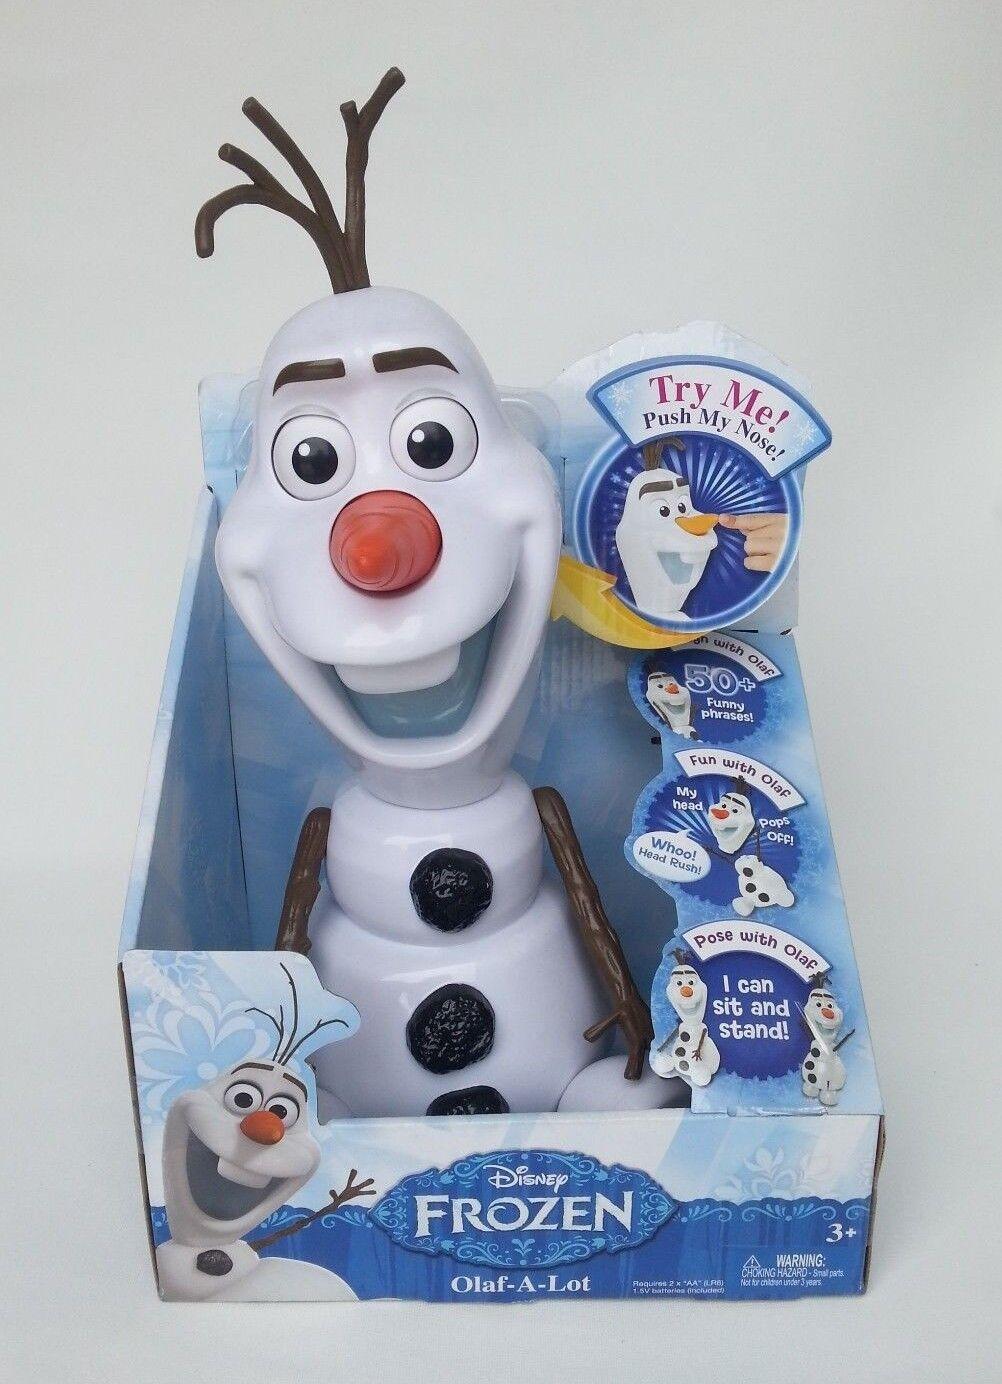 Frozen Olaf-A-Lot Figure Toy Present Christmas Birthday Party Kids Santa